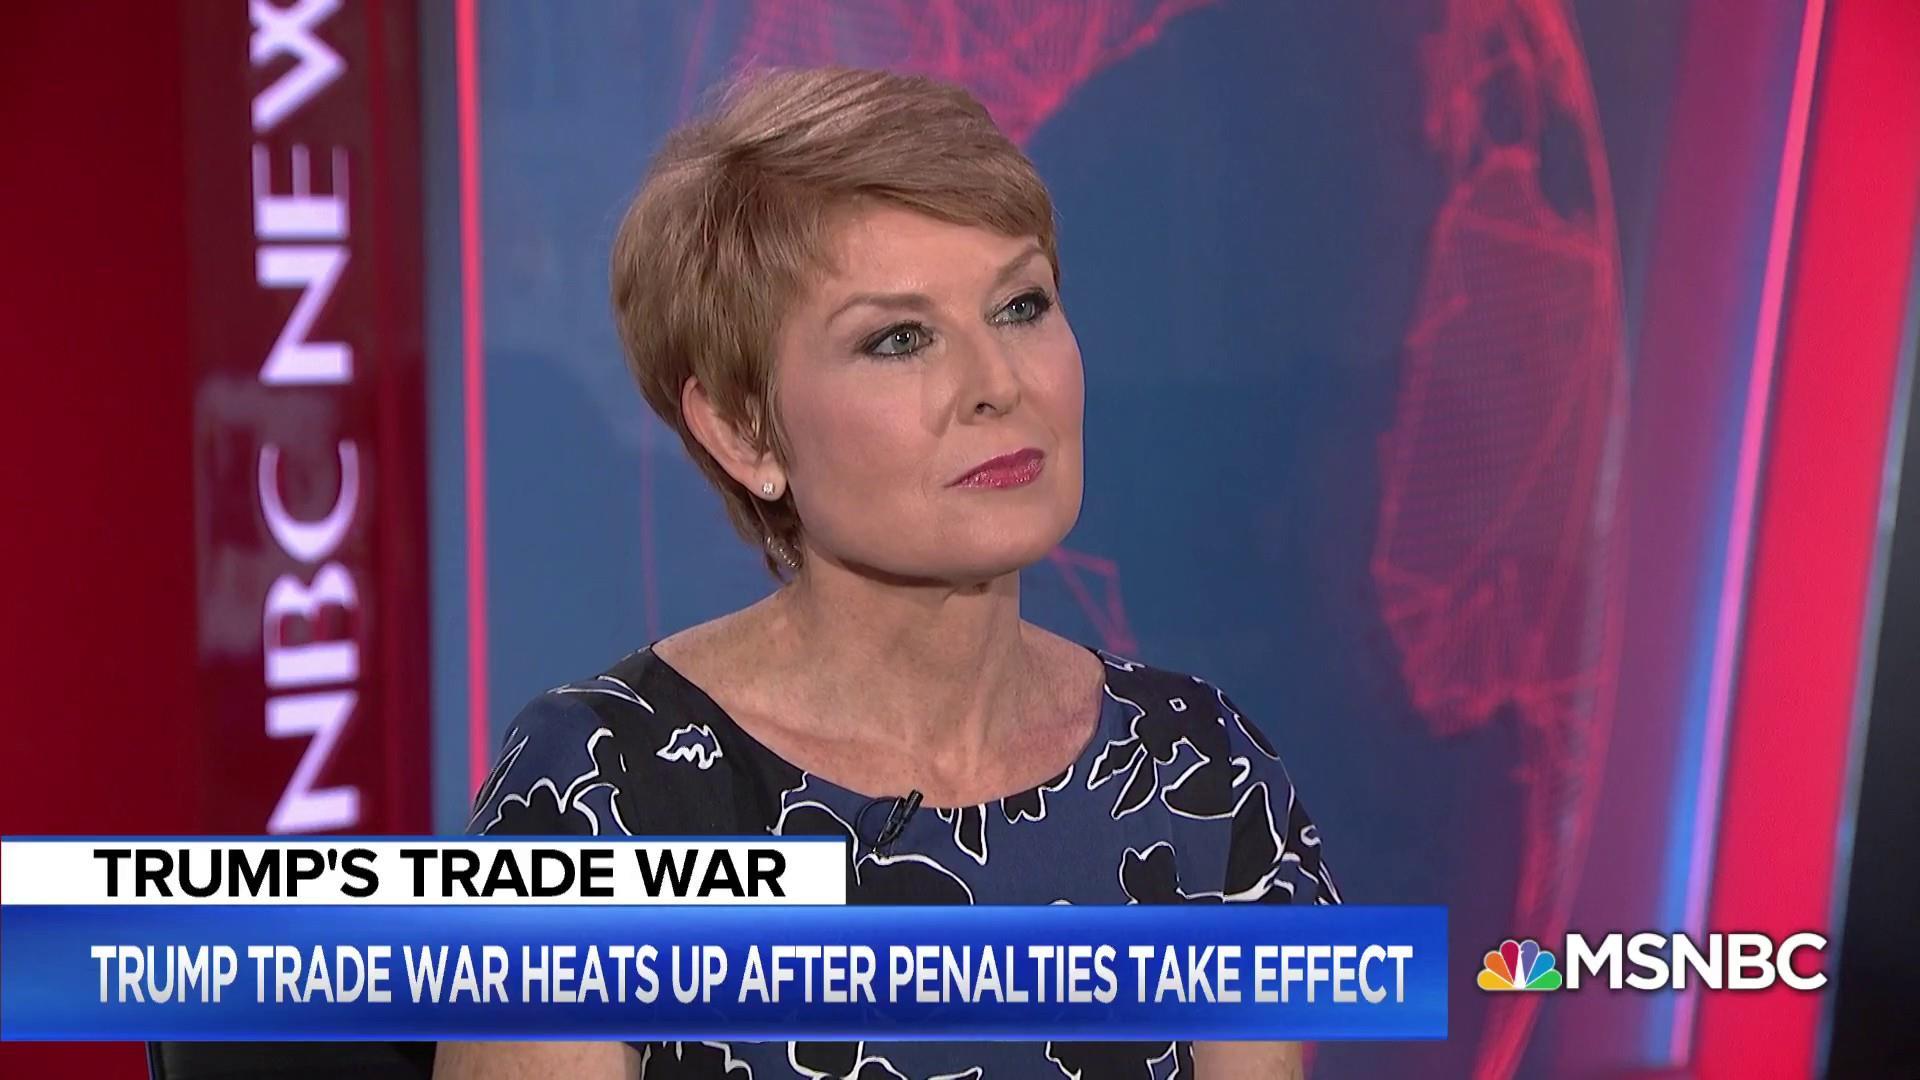 Swonk on Trump's tariffs: 'This is a tax'